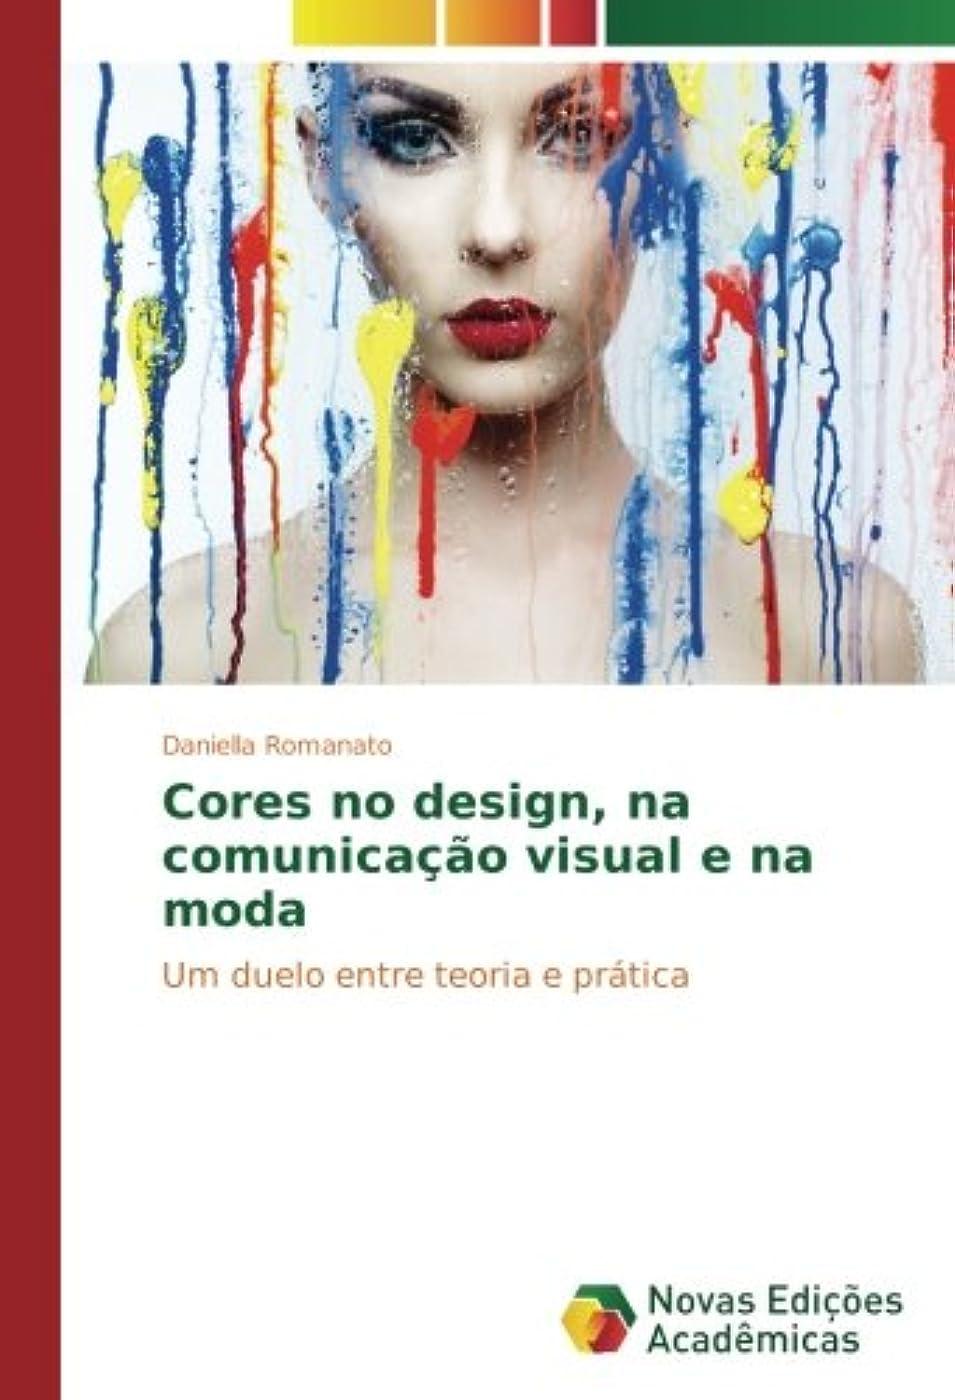 注ぎます定説最大のCores no design, na comunica??o visual e na moda: Um duelo entre teoria e prática